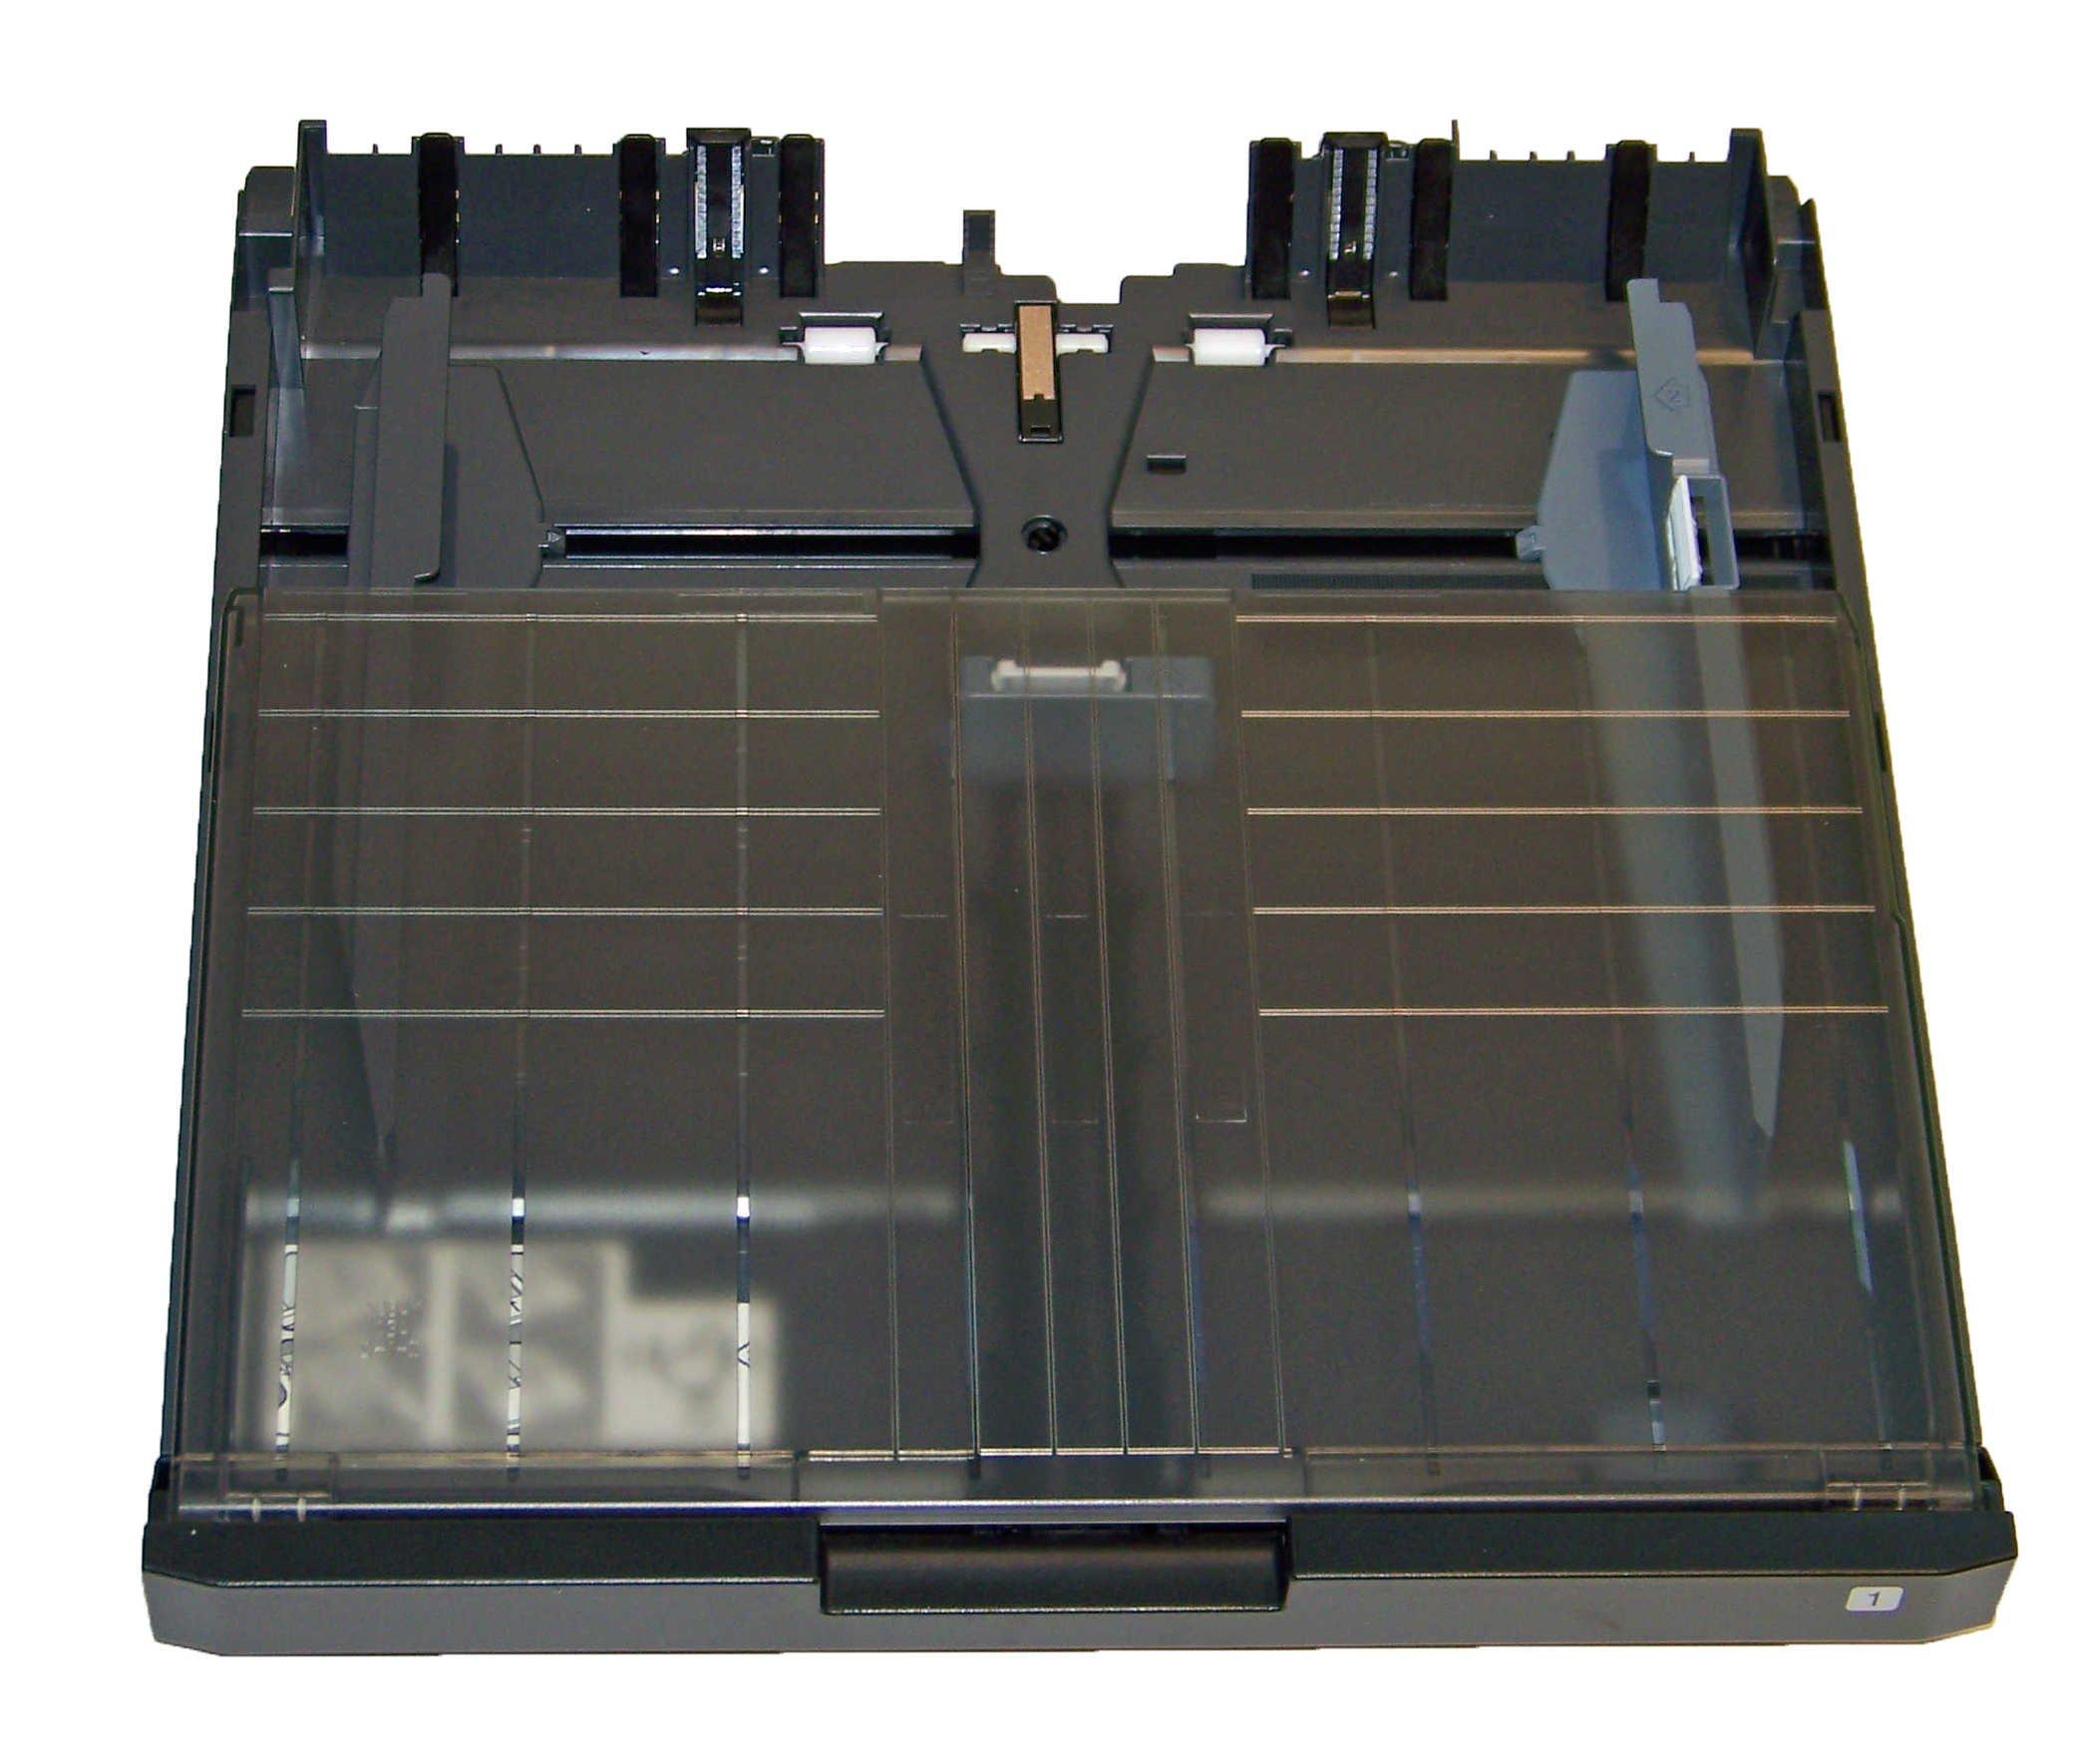 OEM Epson Paper Cassette Assembly For Epson WorkForce WF-7710, WF-7711, WF-7715